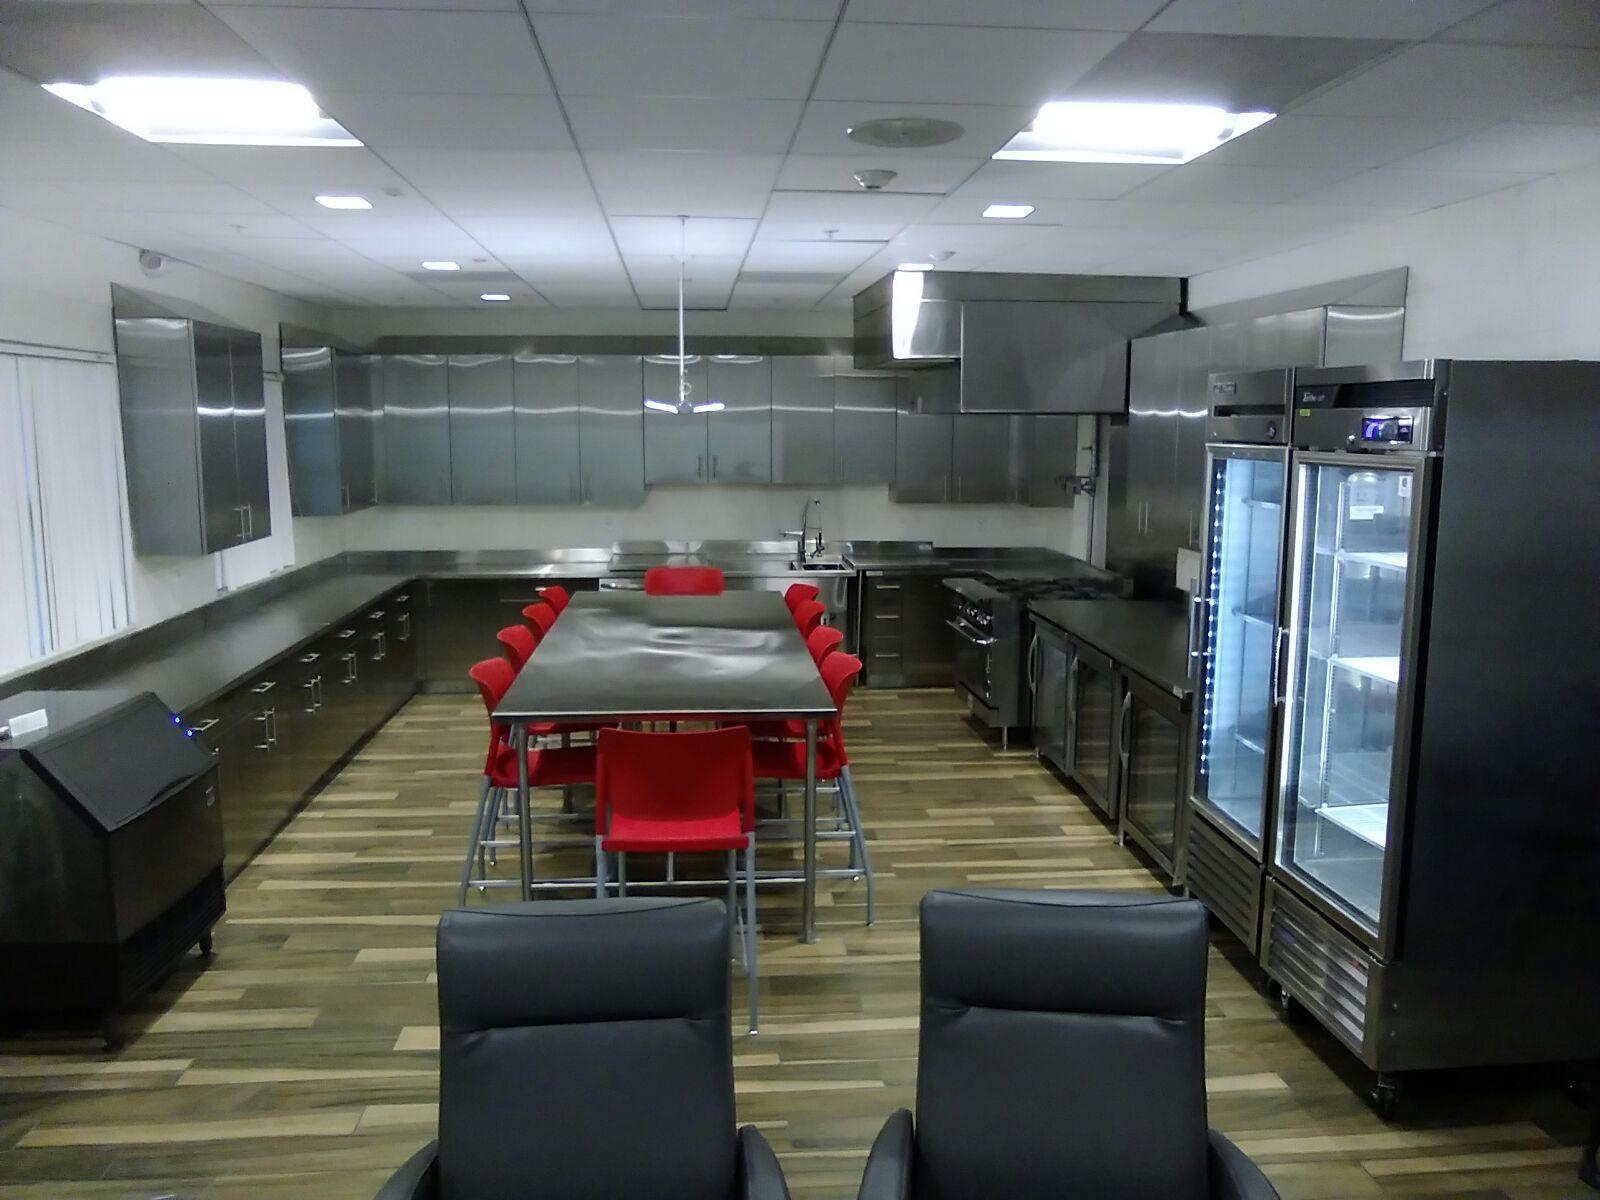 Stainless Steel commercial kitchen cabinets. | SteelKitchen